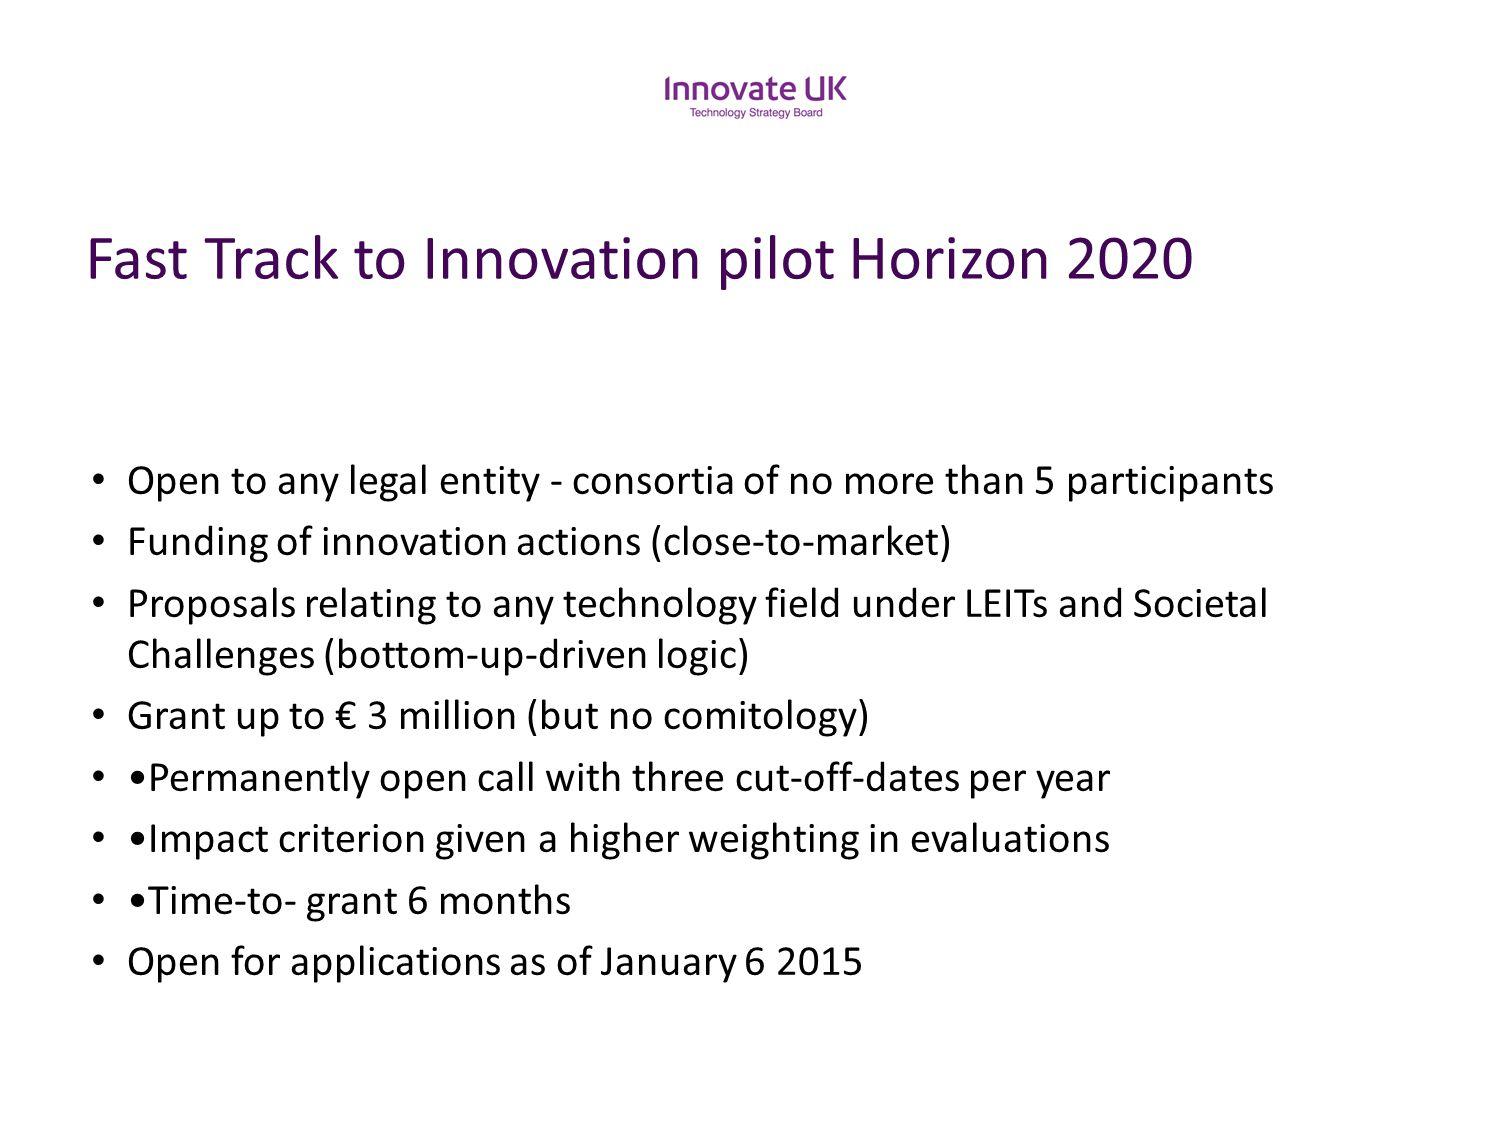 Fast Track to Innovation pilot Horizon 2020